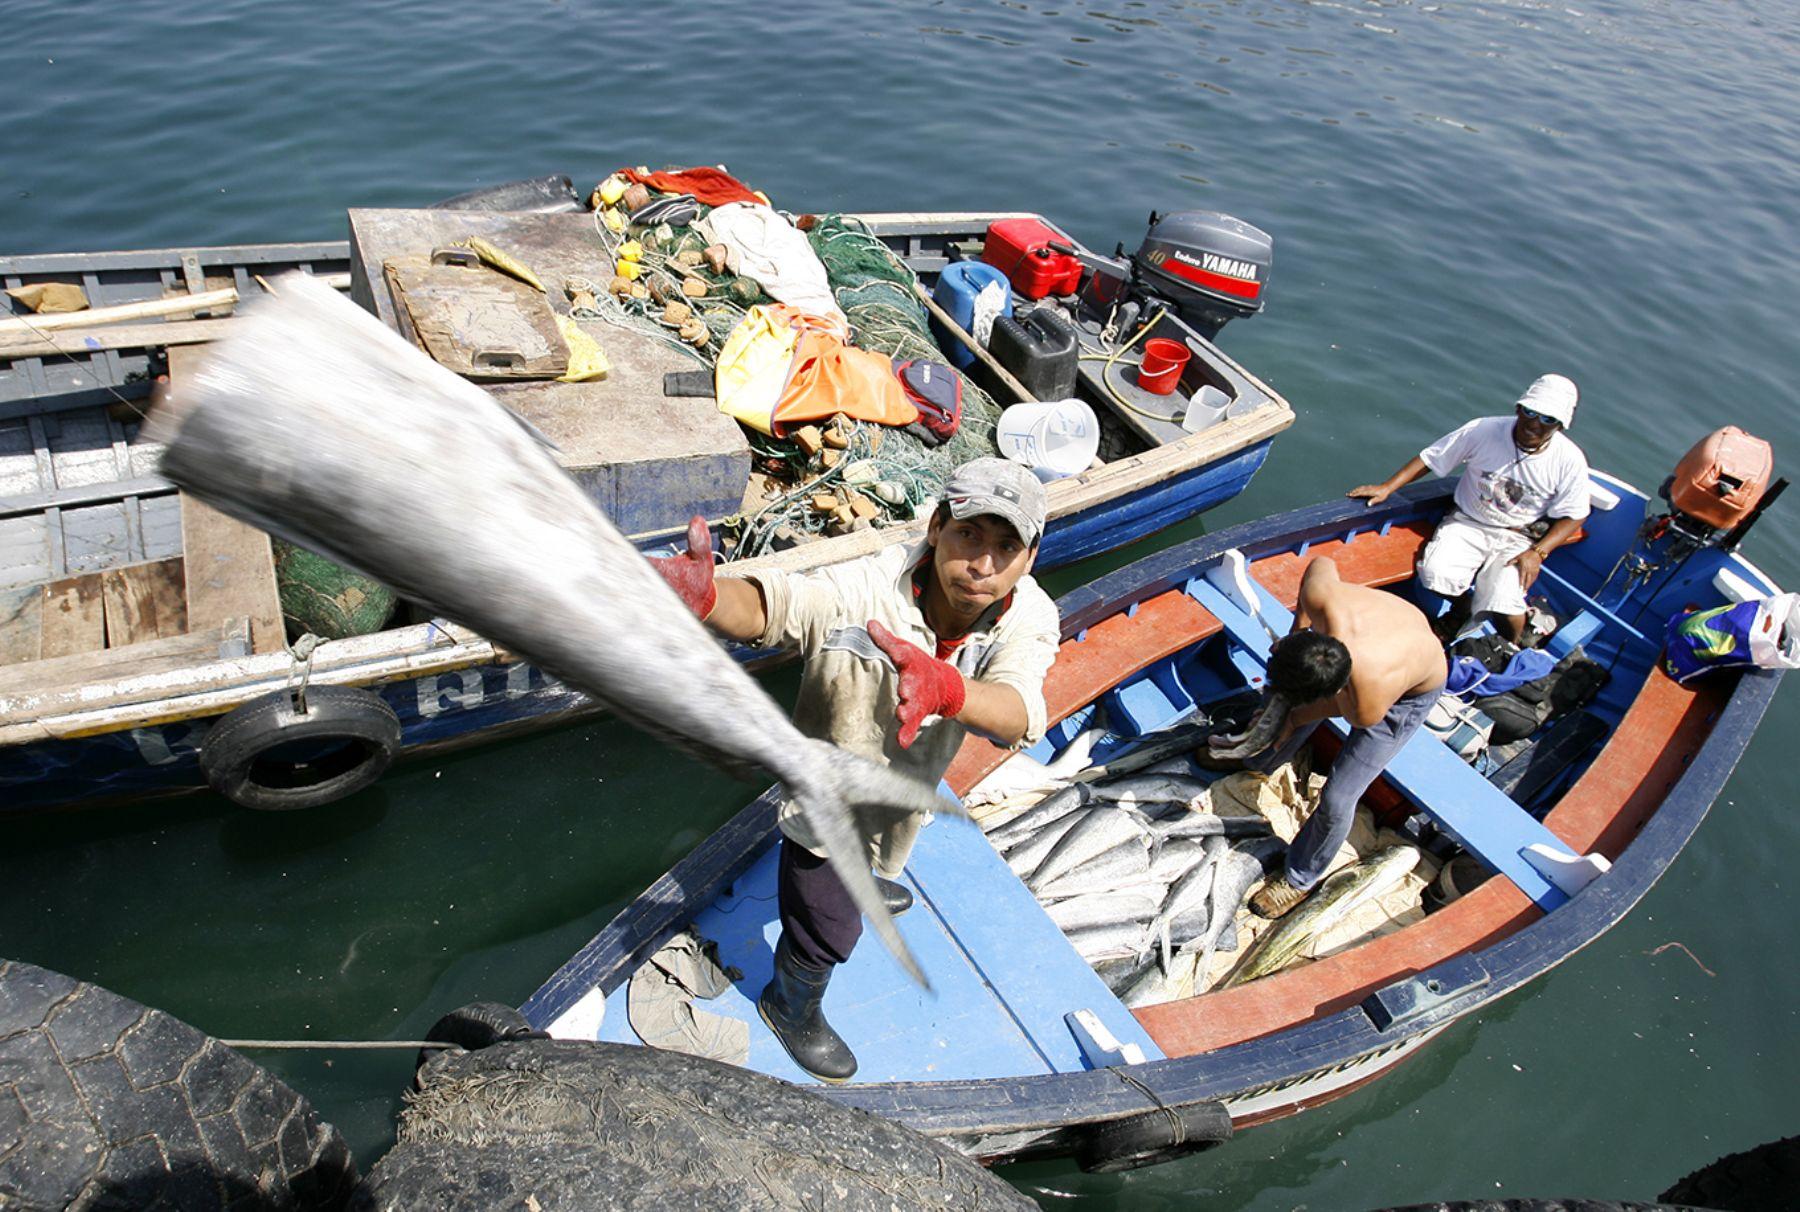 Abundancia de peces de consumo humano beneficia a for Cria de peces para consumo humano